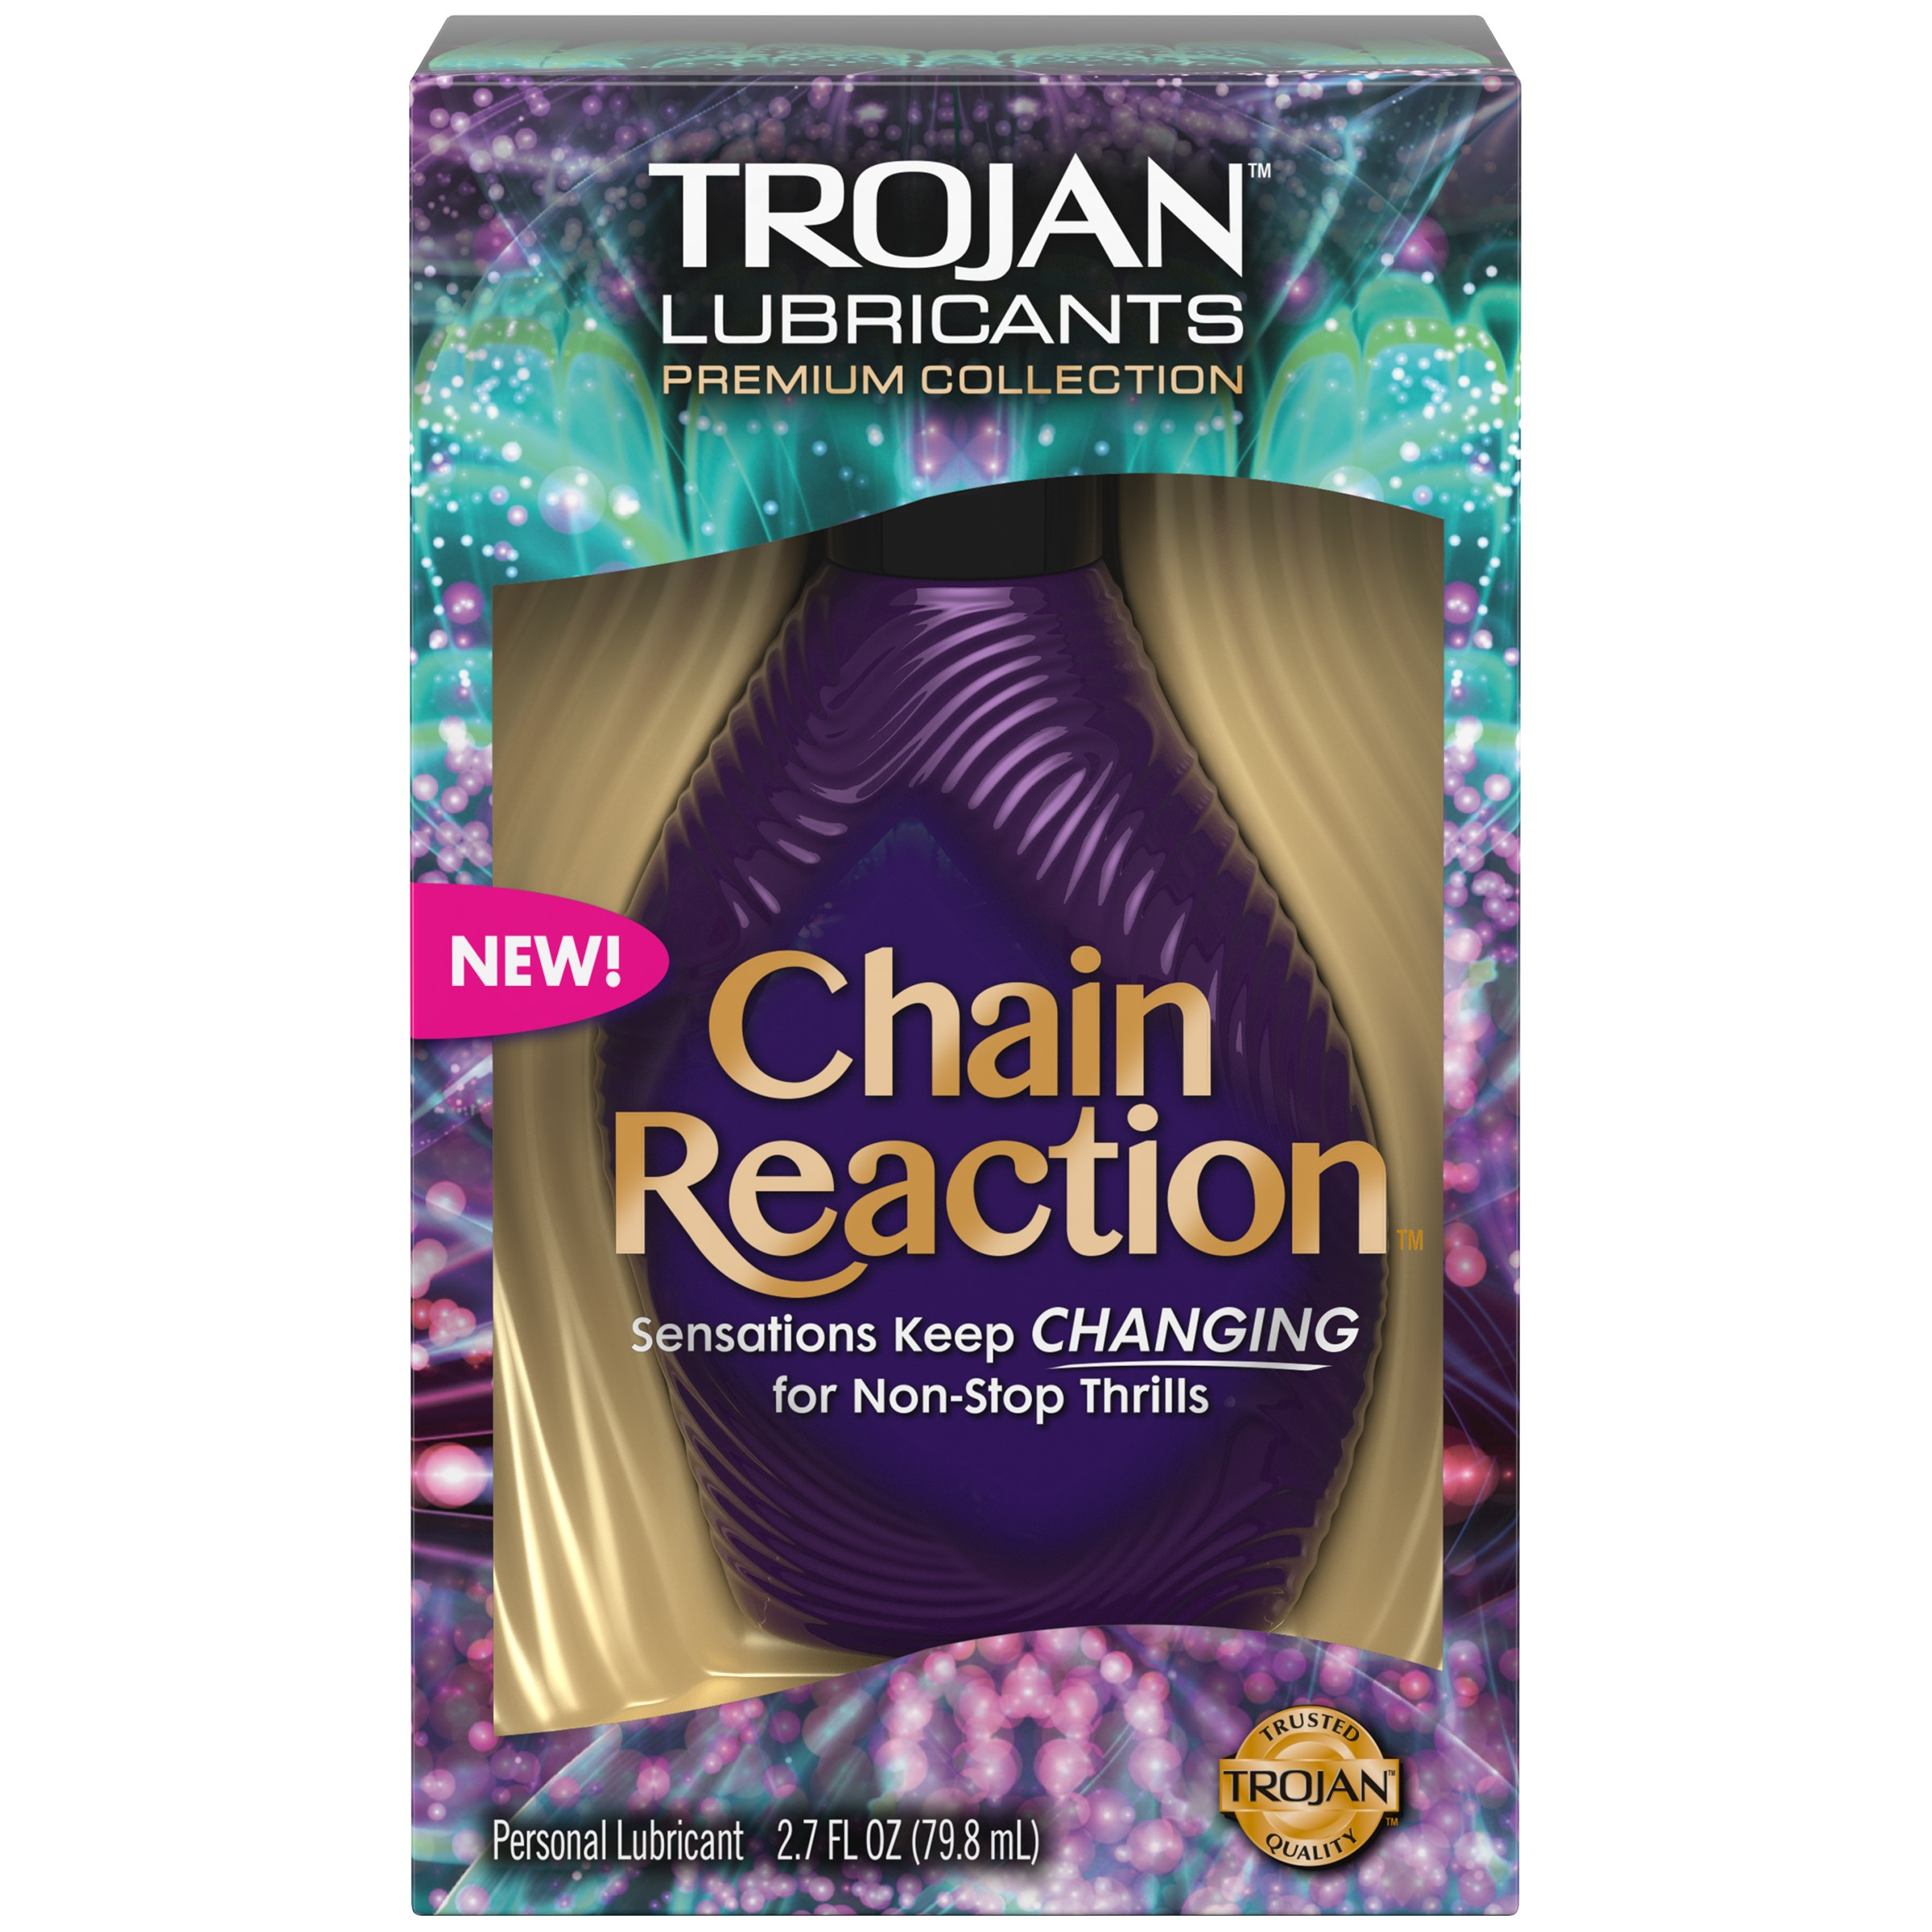 TROJAN Chain Reaction Personal Lubricant, 2.7 Fl Oz